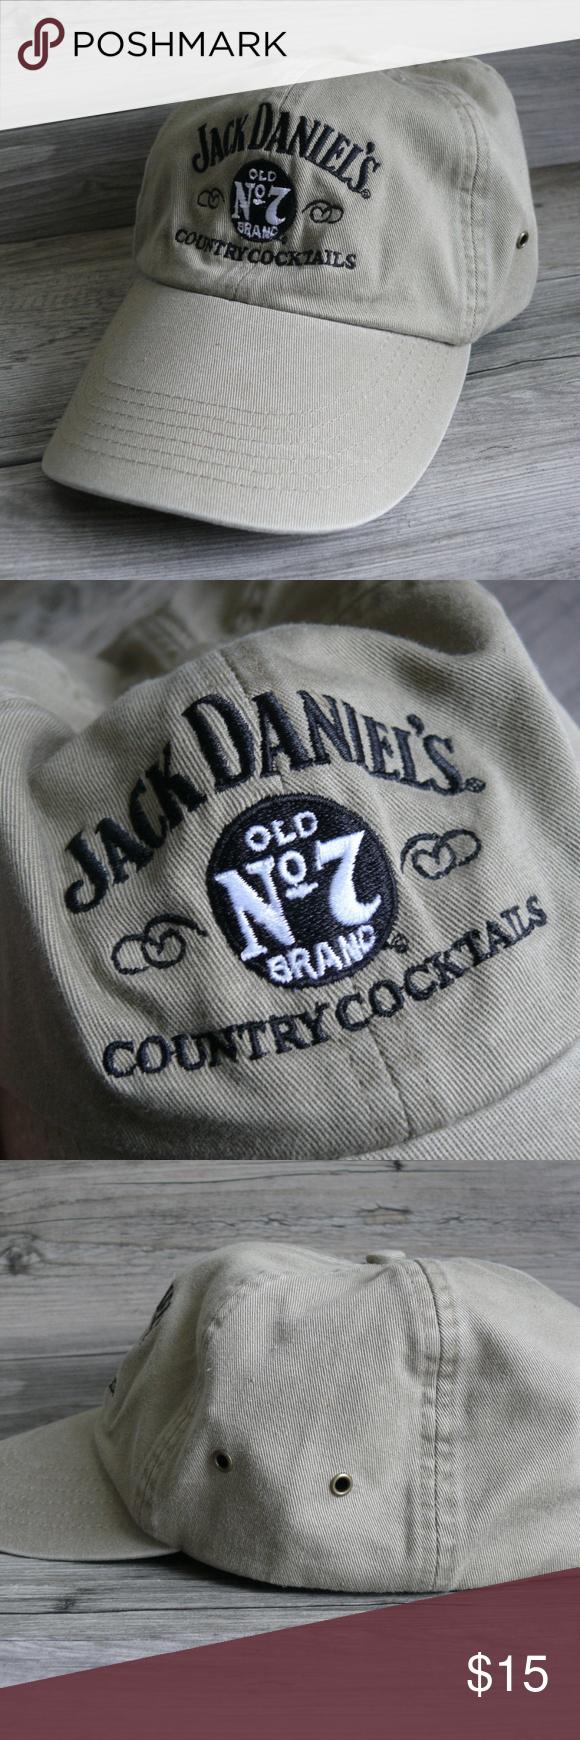 386c8624c07 Jack Daniel s Old No 7 Brand Hat Ball Cap Jack Daniel s Old No 7 Brand  Country